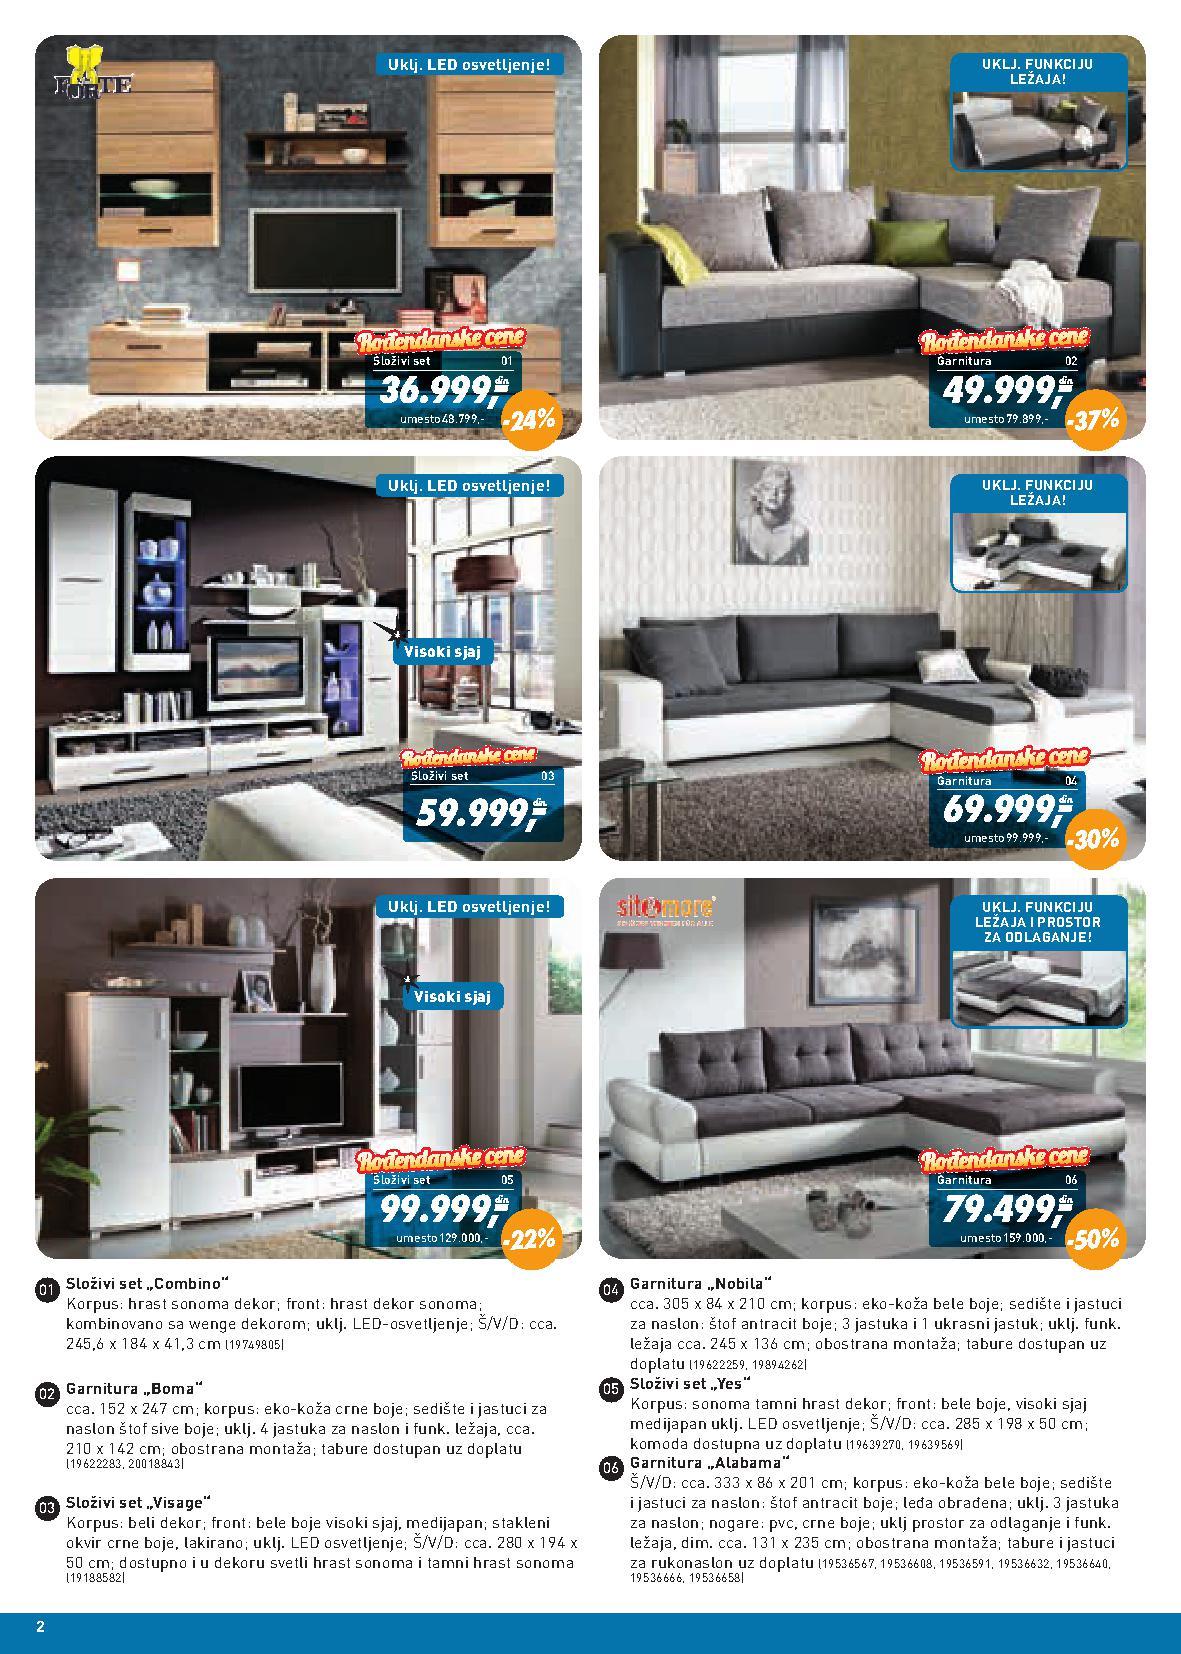 Kika katalog najbolje za vaš dom po super ceni